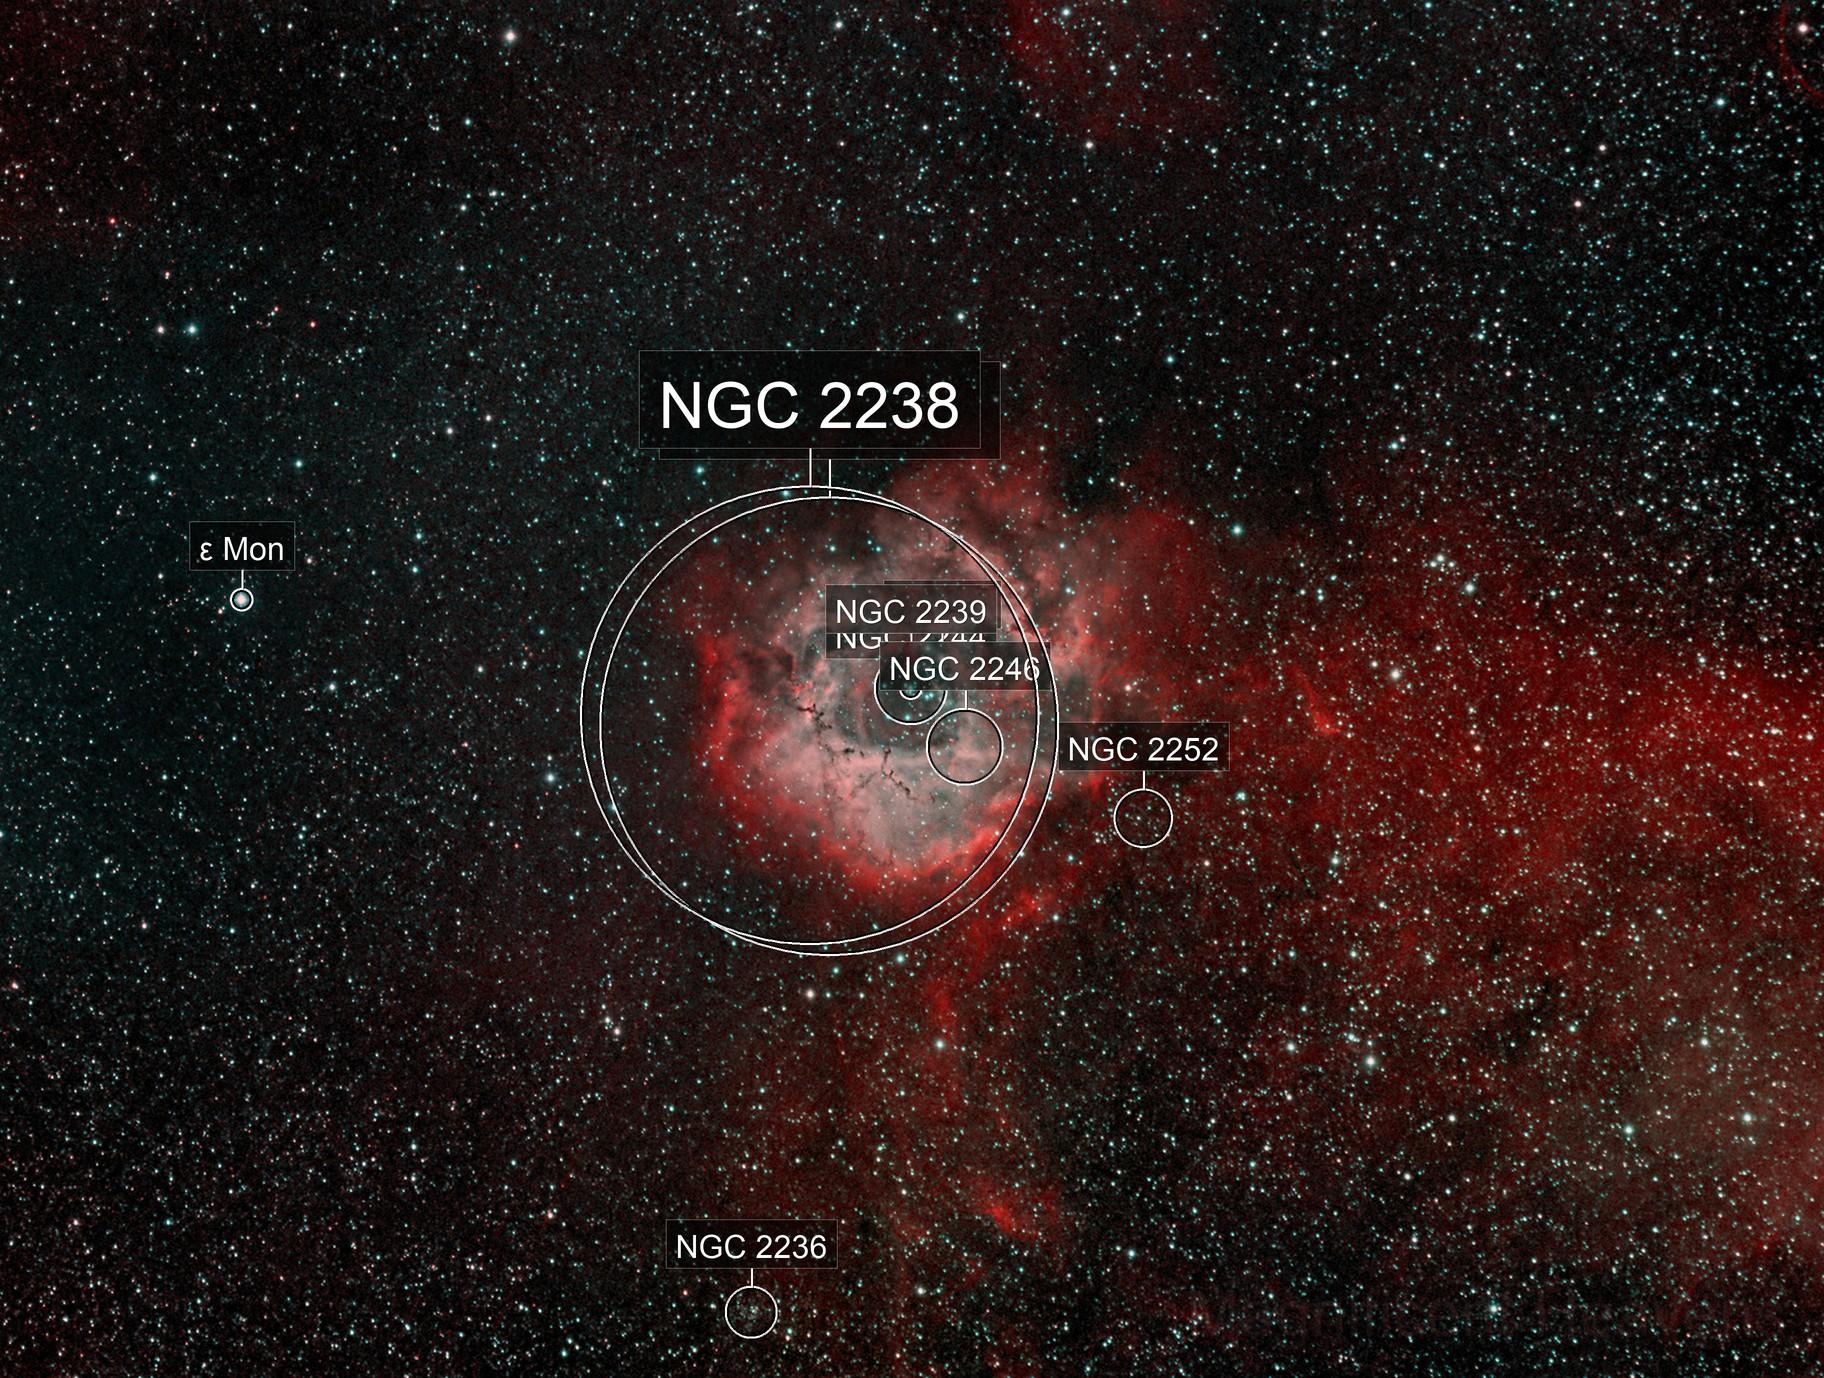 Bicolor Image of the Rosette Nebula